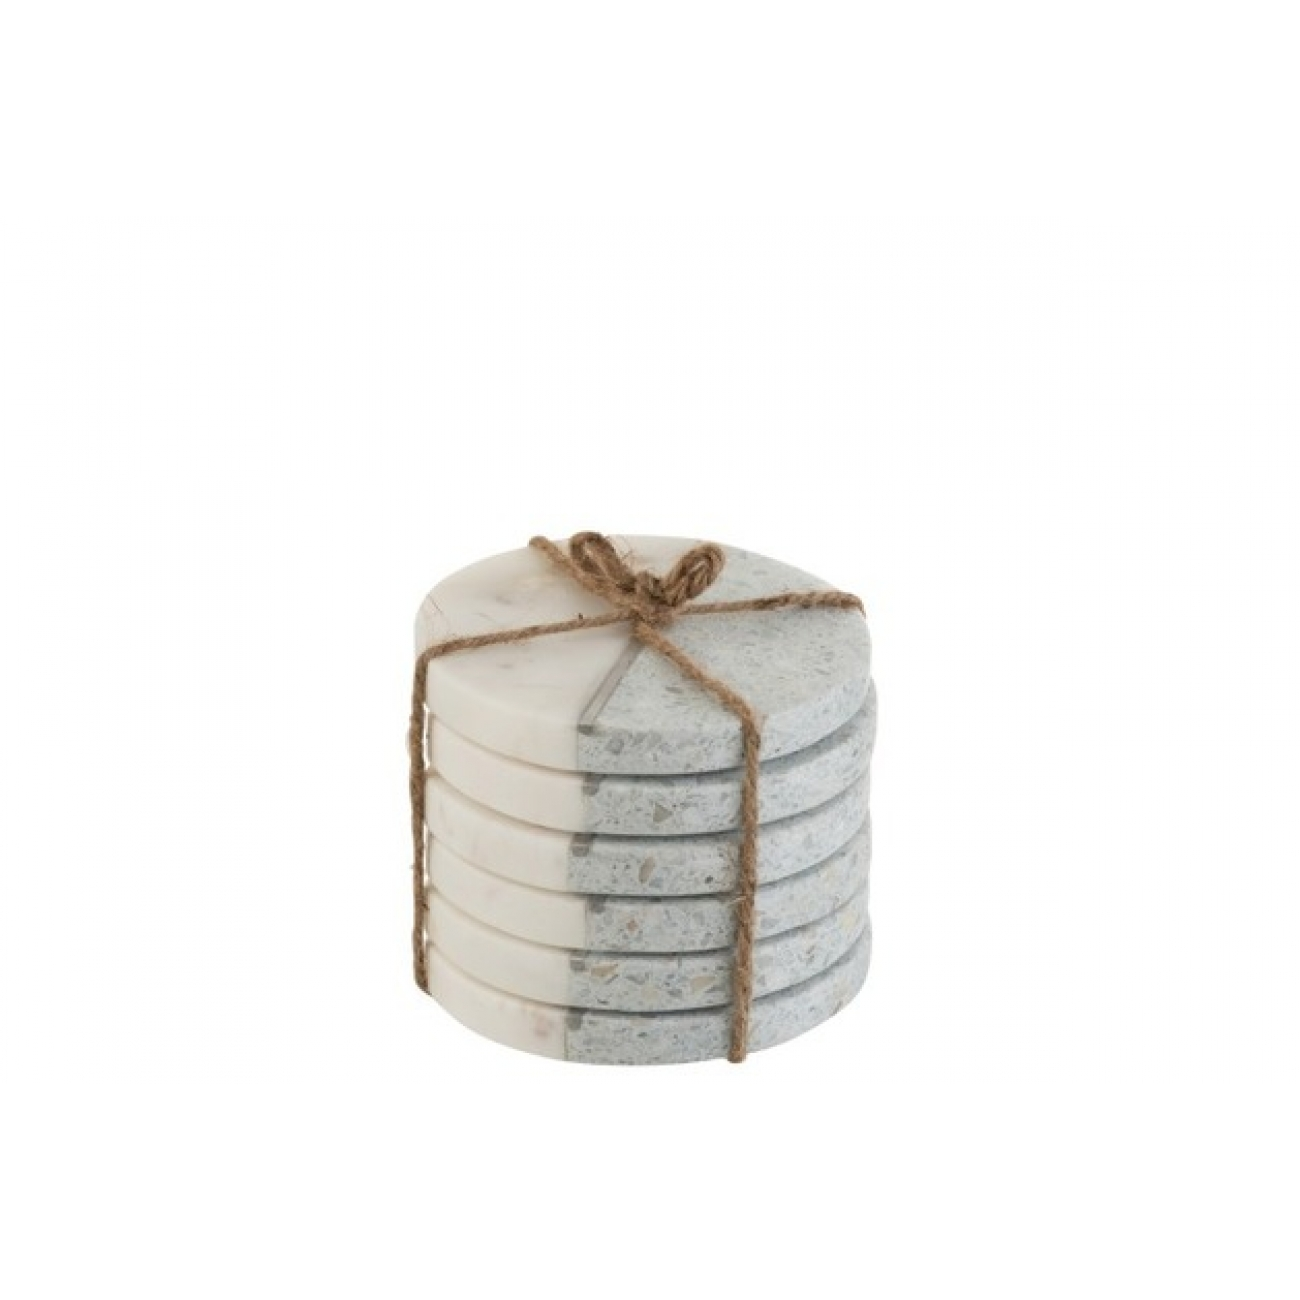 Набор из 6-ти подставок под чашки J-LINE камень и мрамор  диаметр 10 см